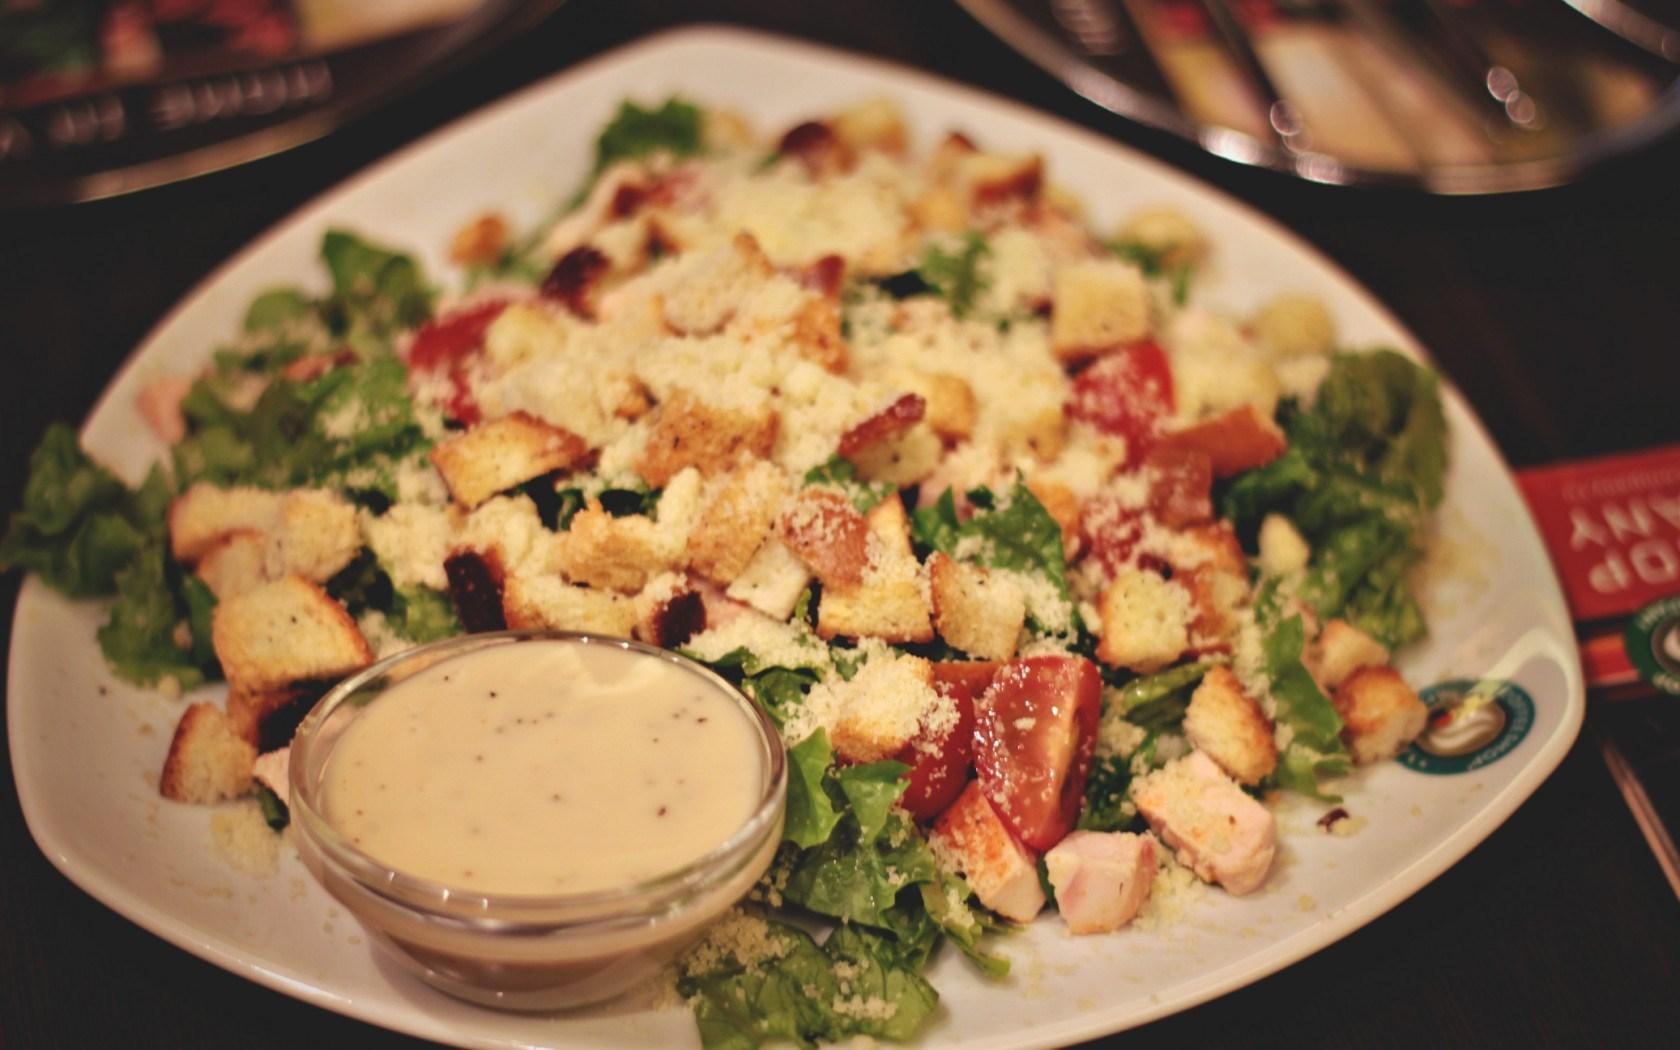 Цезарь салат в тарелке